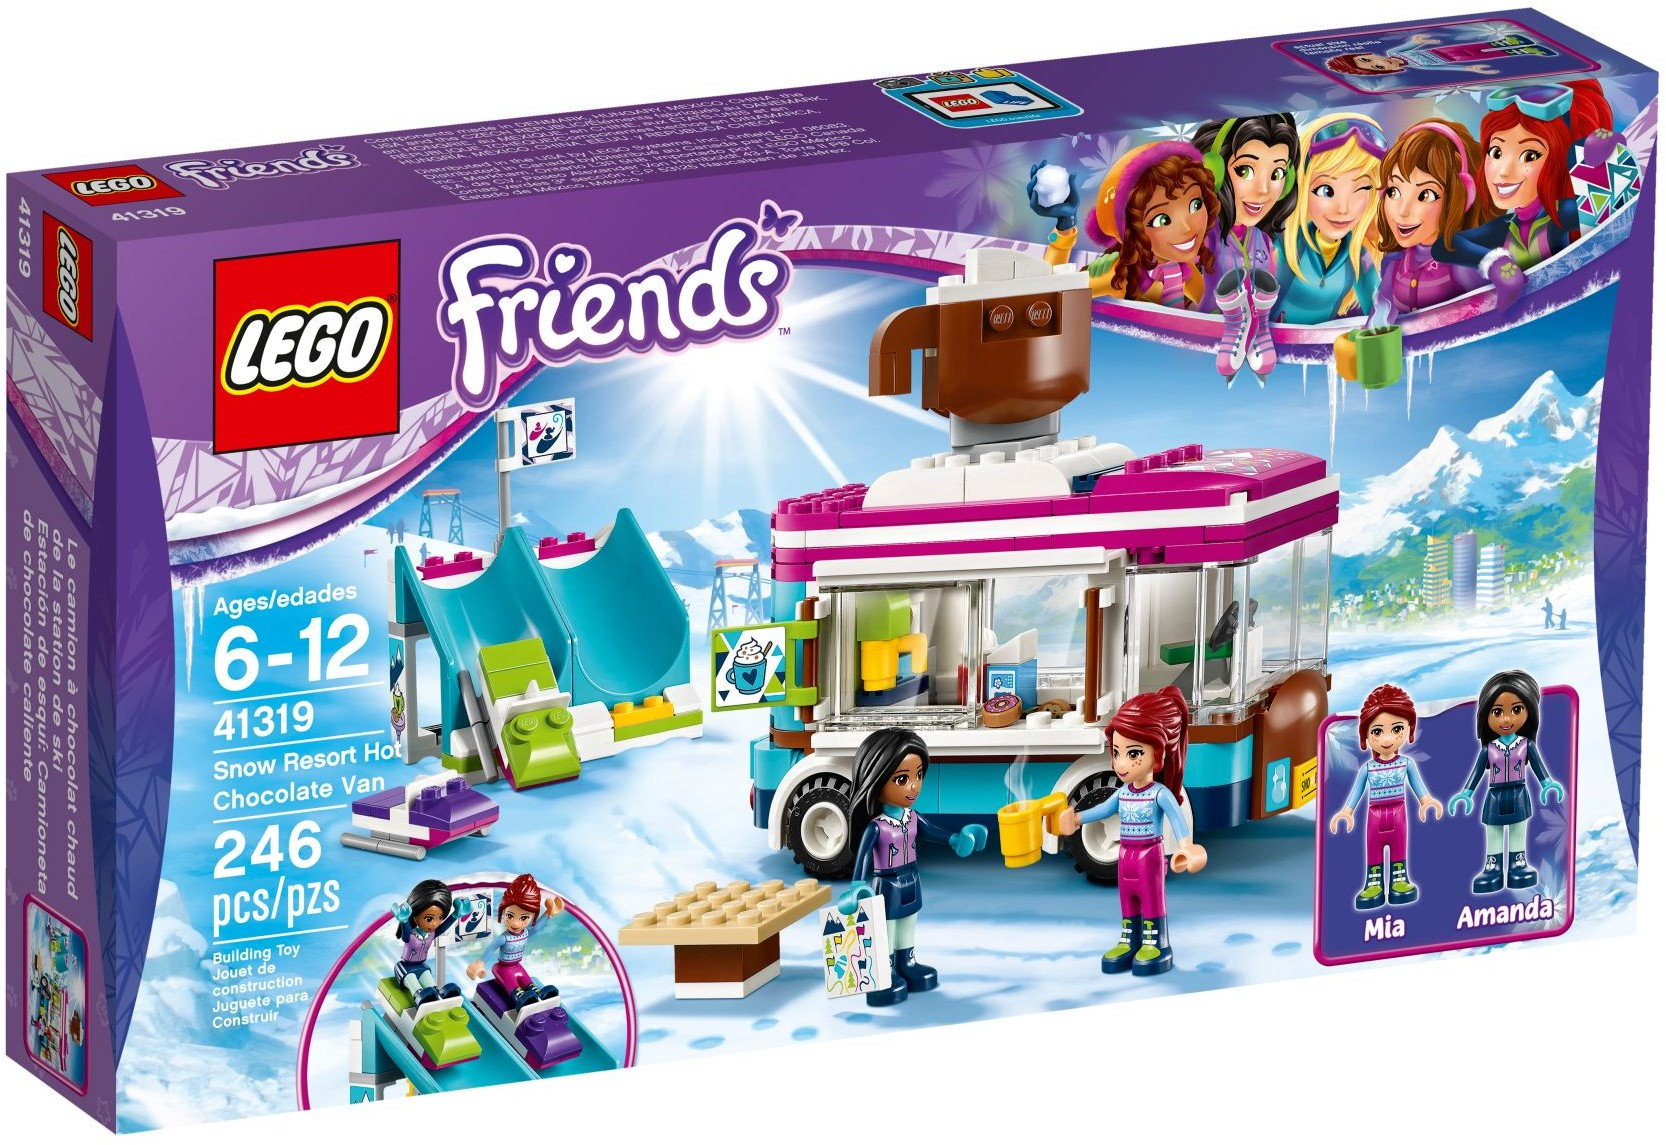 File:Snow-Resort-Hot-Chocolate-Van-41319-box-front-600x422.jpg